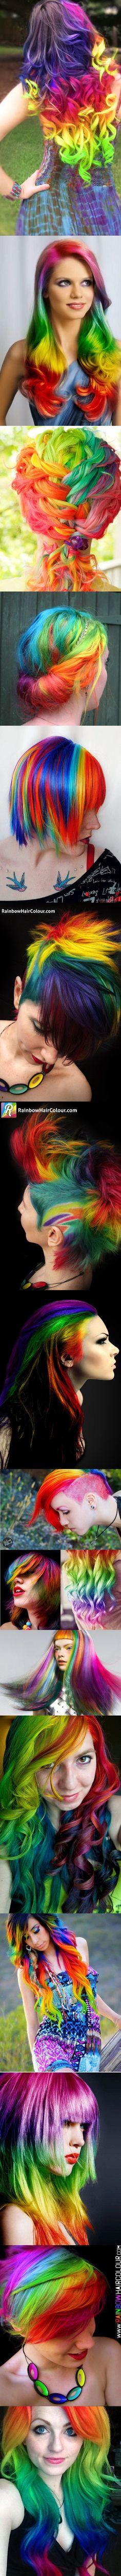 www.fb.com/haircuts